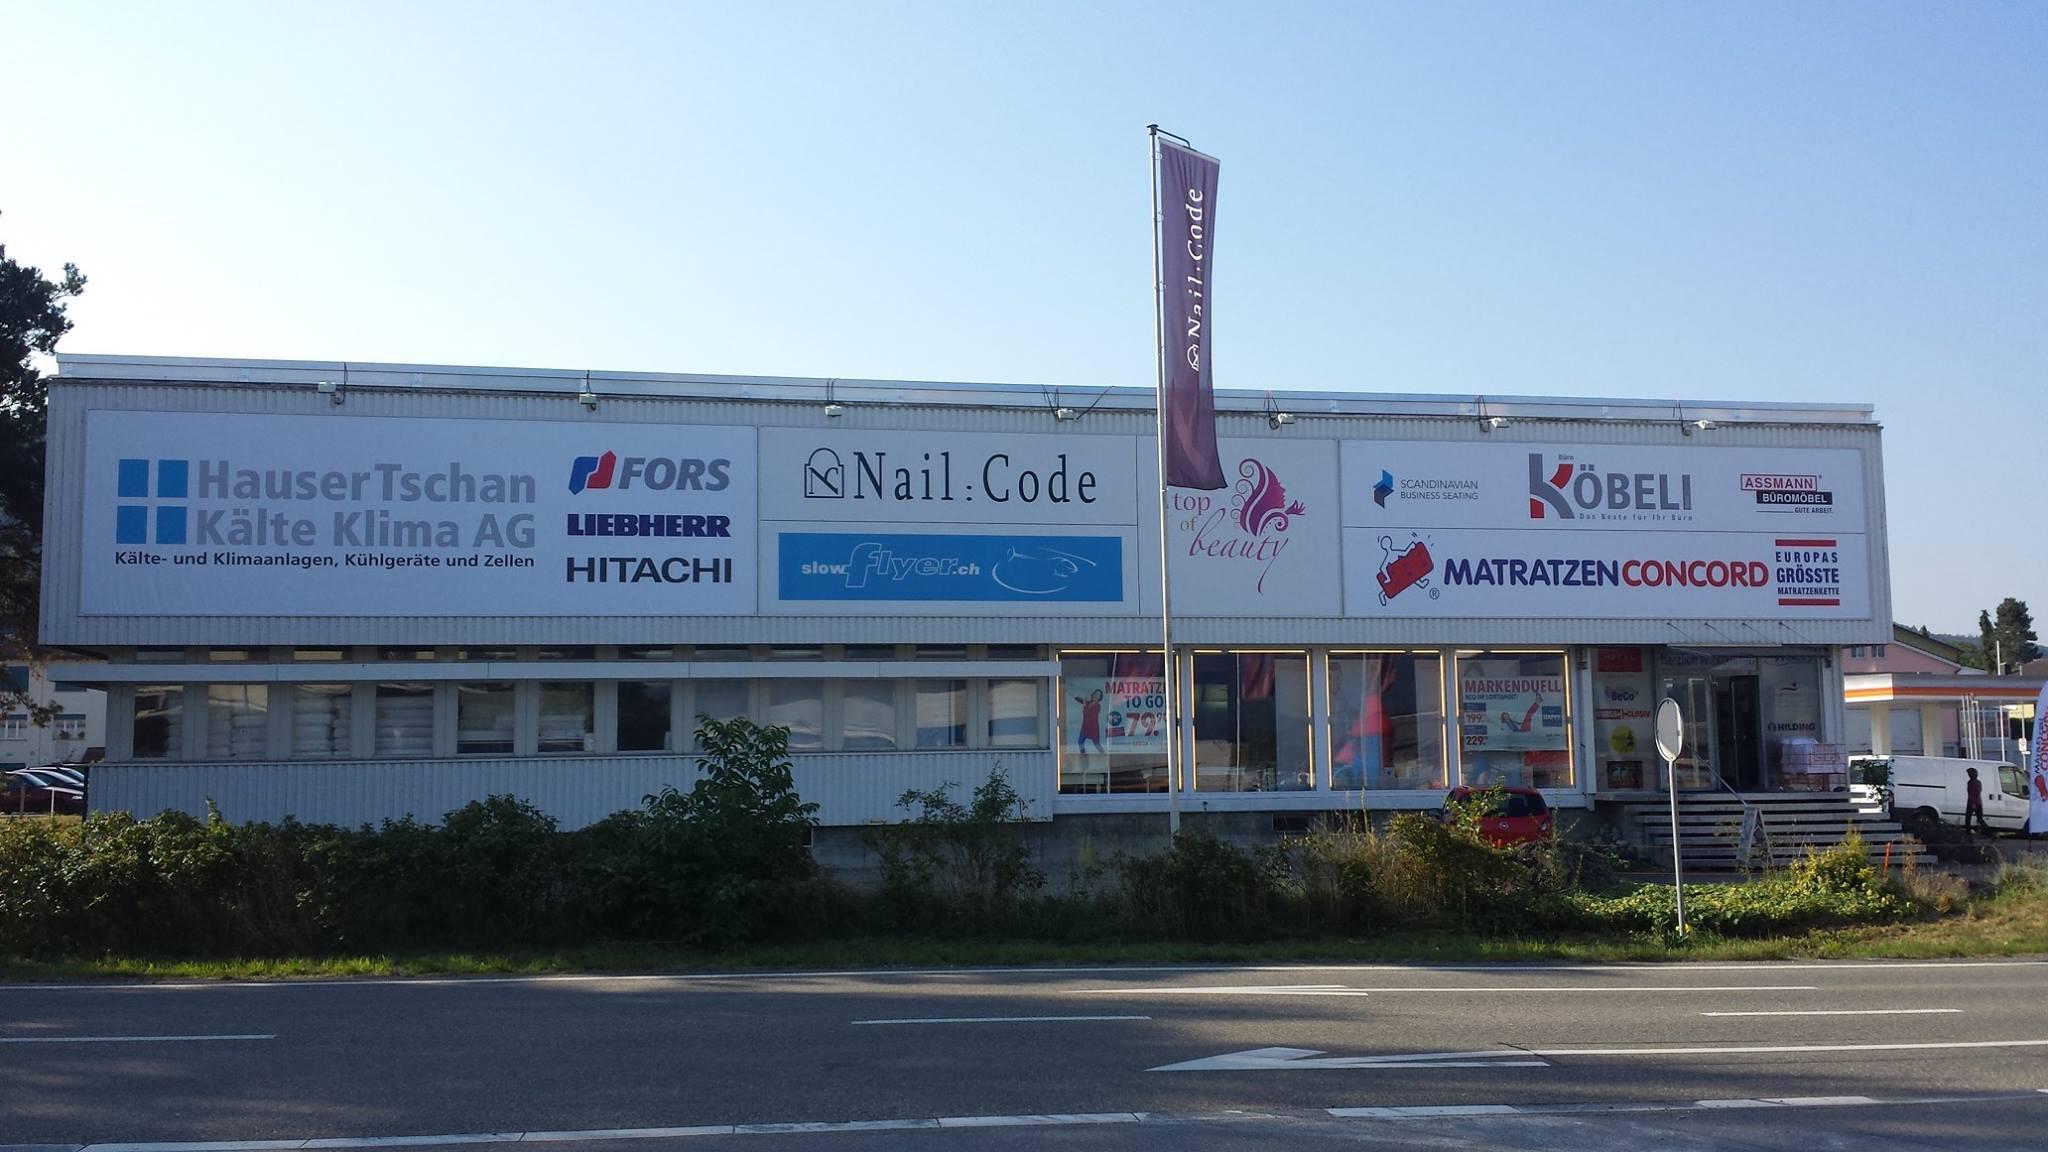 Büro Köbeli GmbH